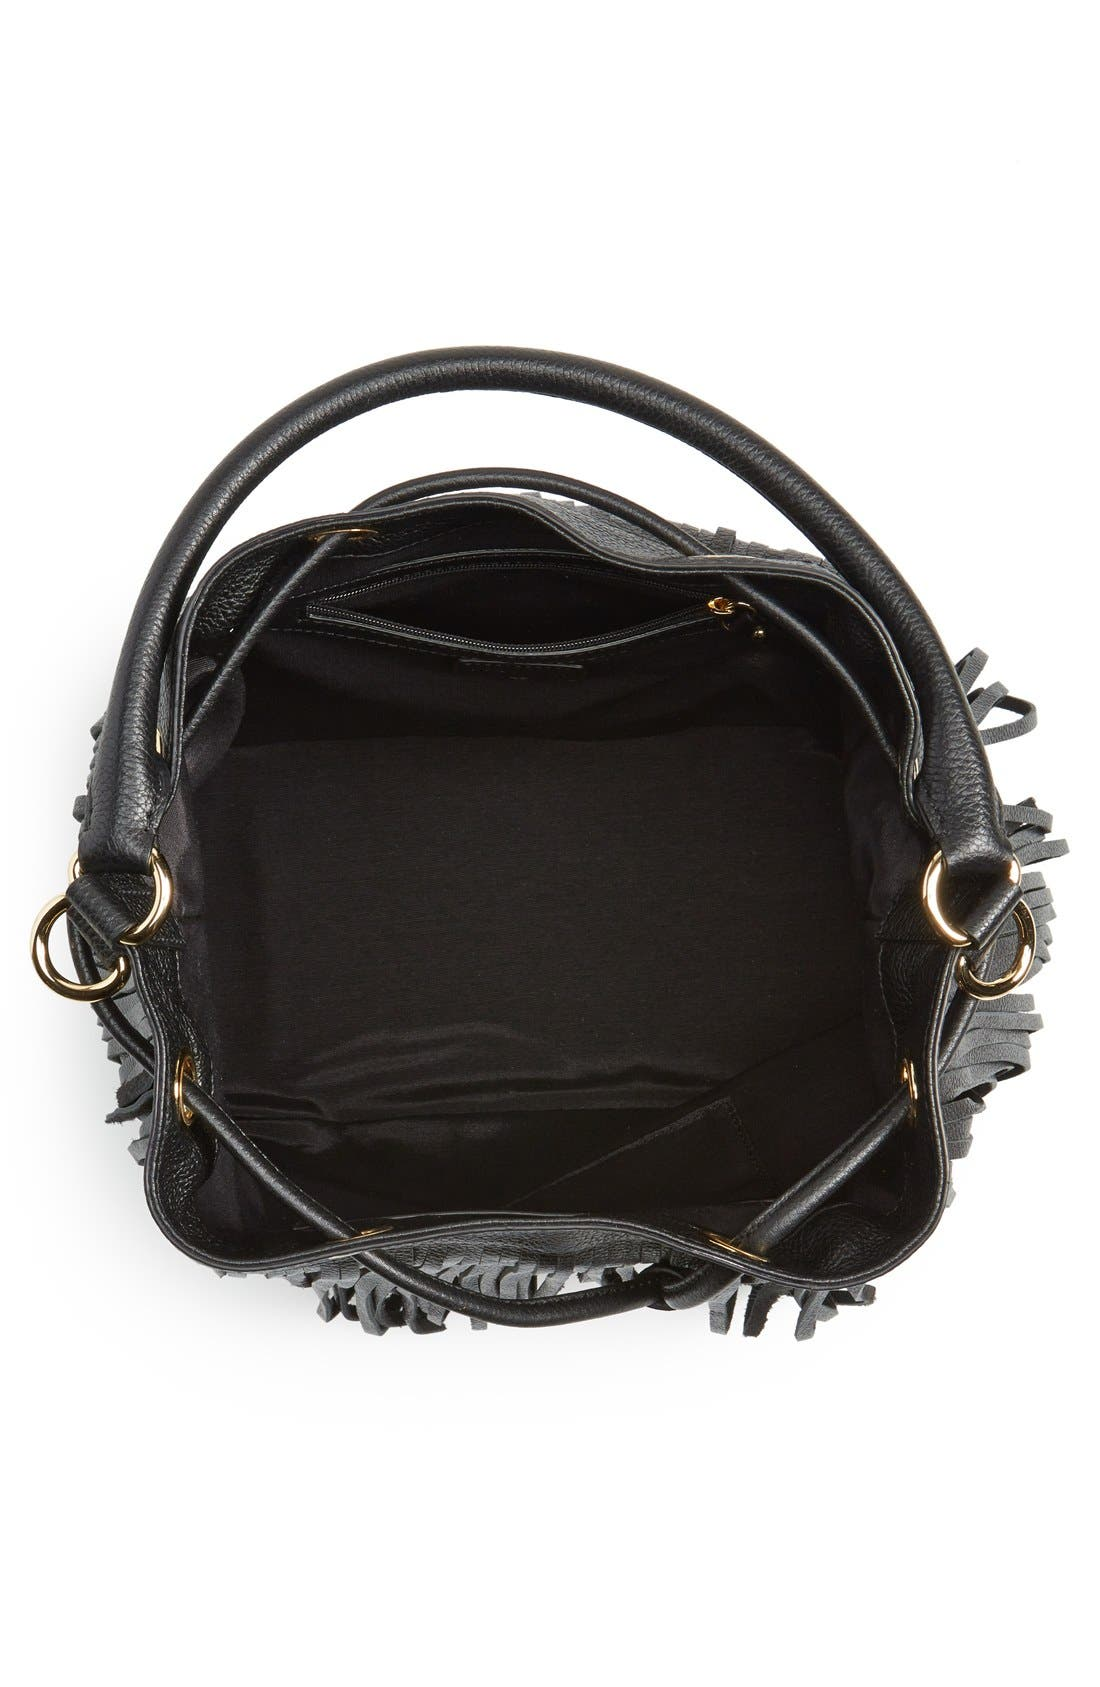 'Essex' Fringed Leather Bucket Bag,                             Alternate thumbnail 5, color,                             001